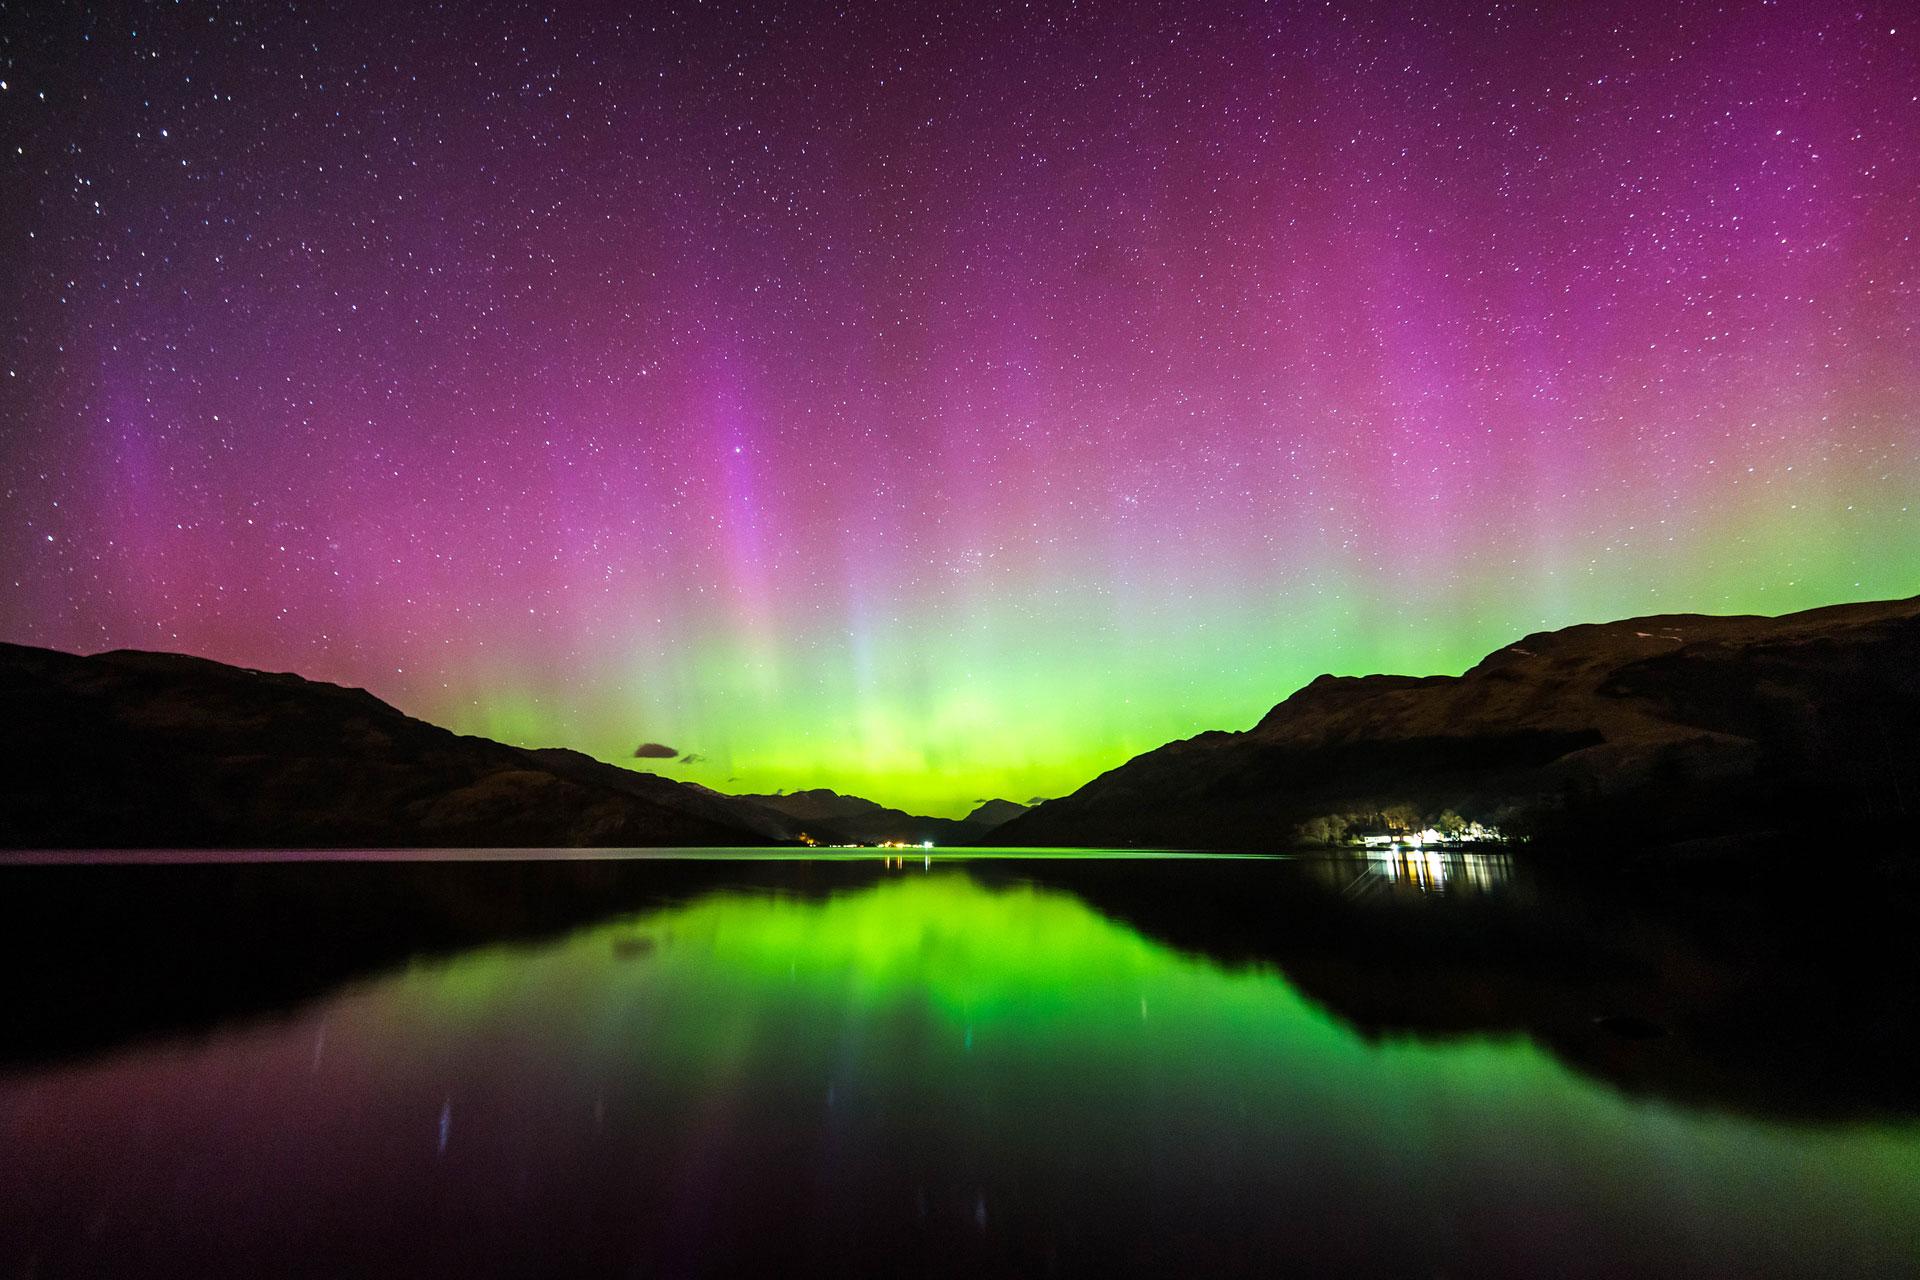 Last Night's Northern Lights | Christopher Martin Photography